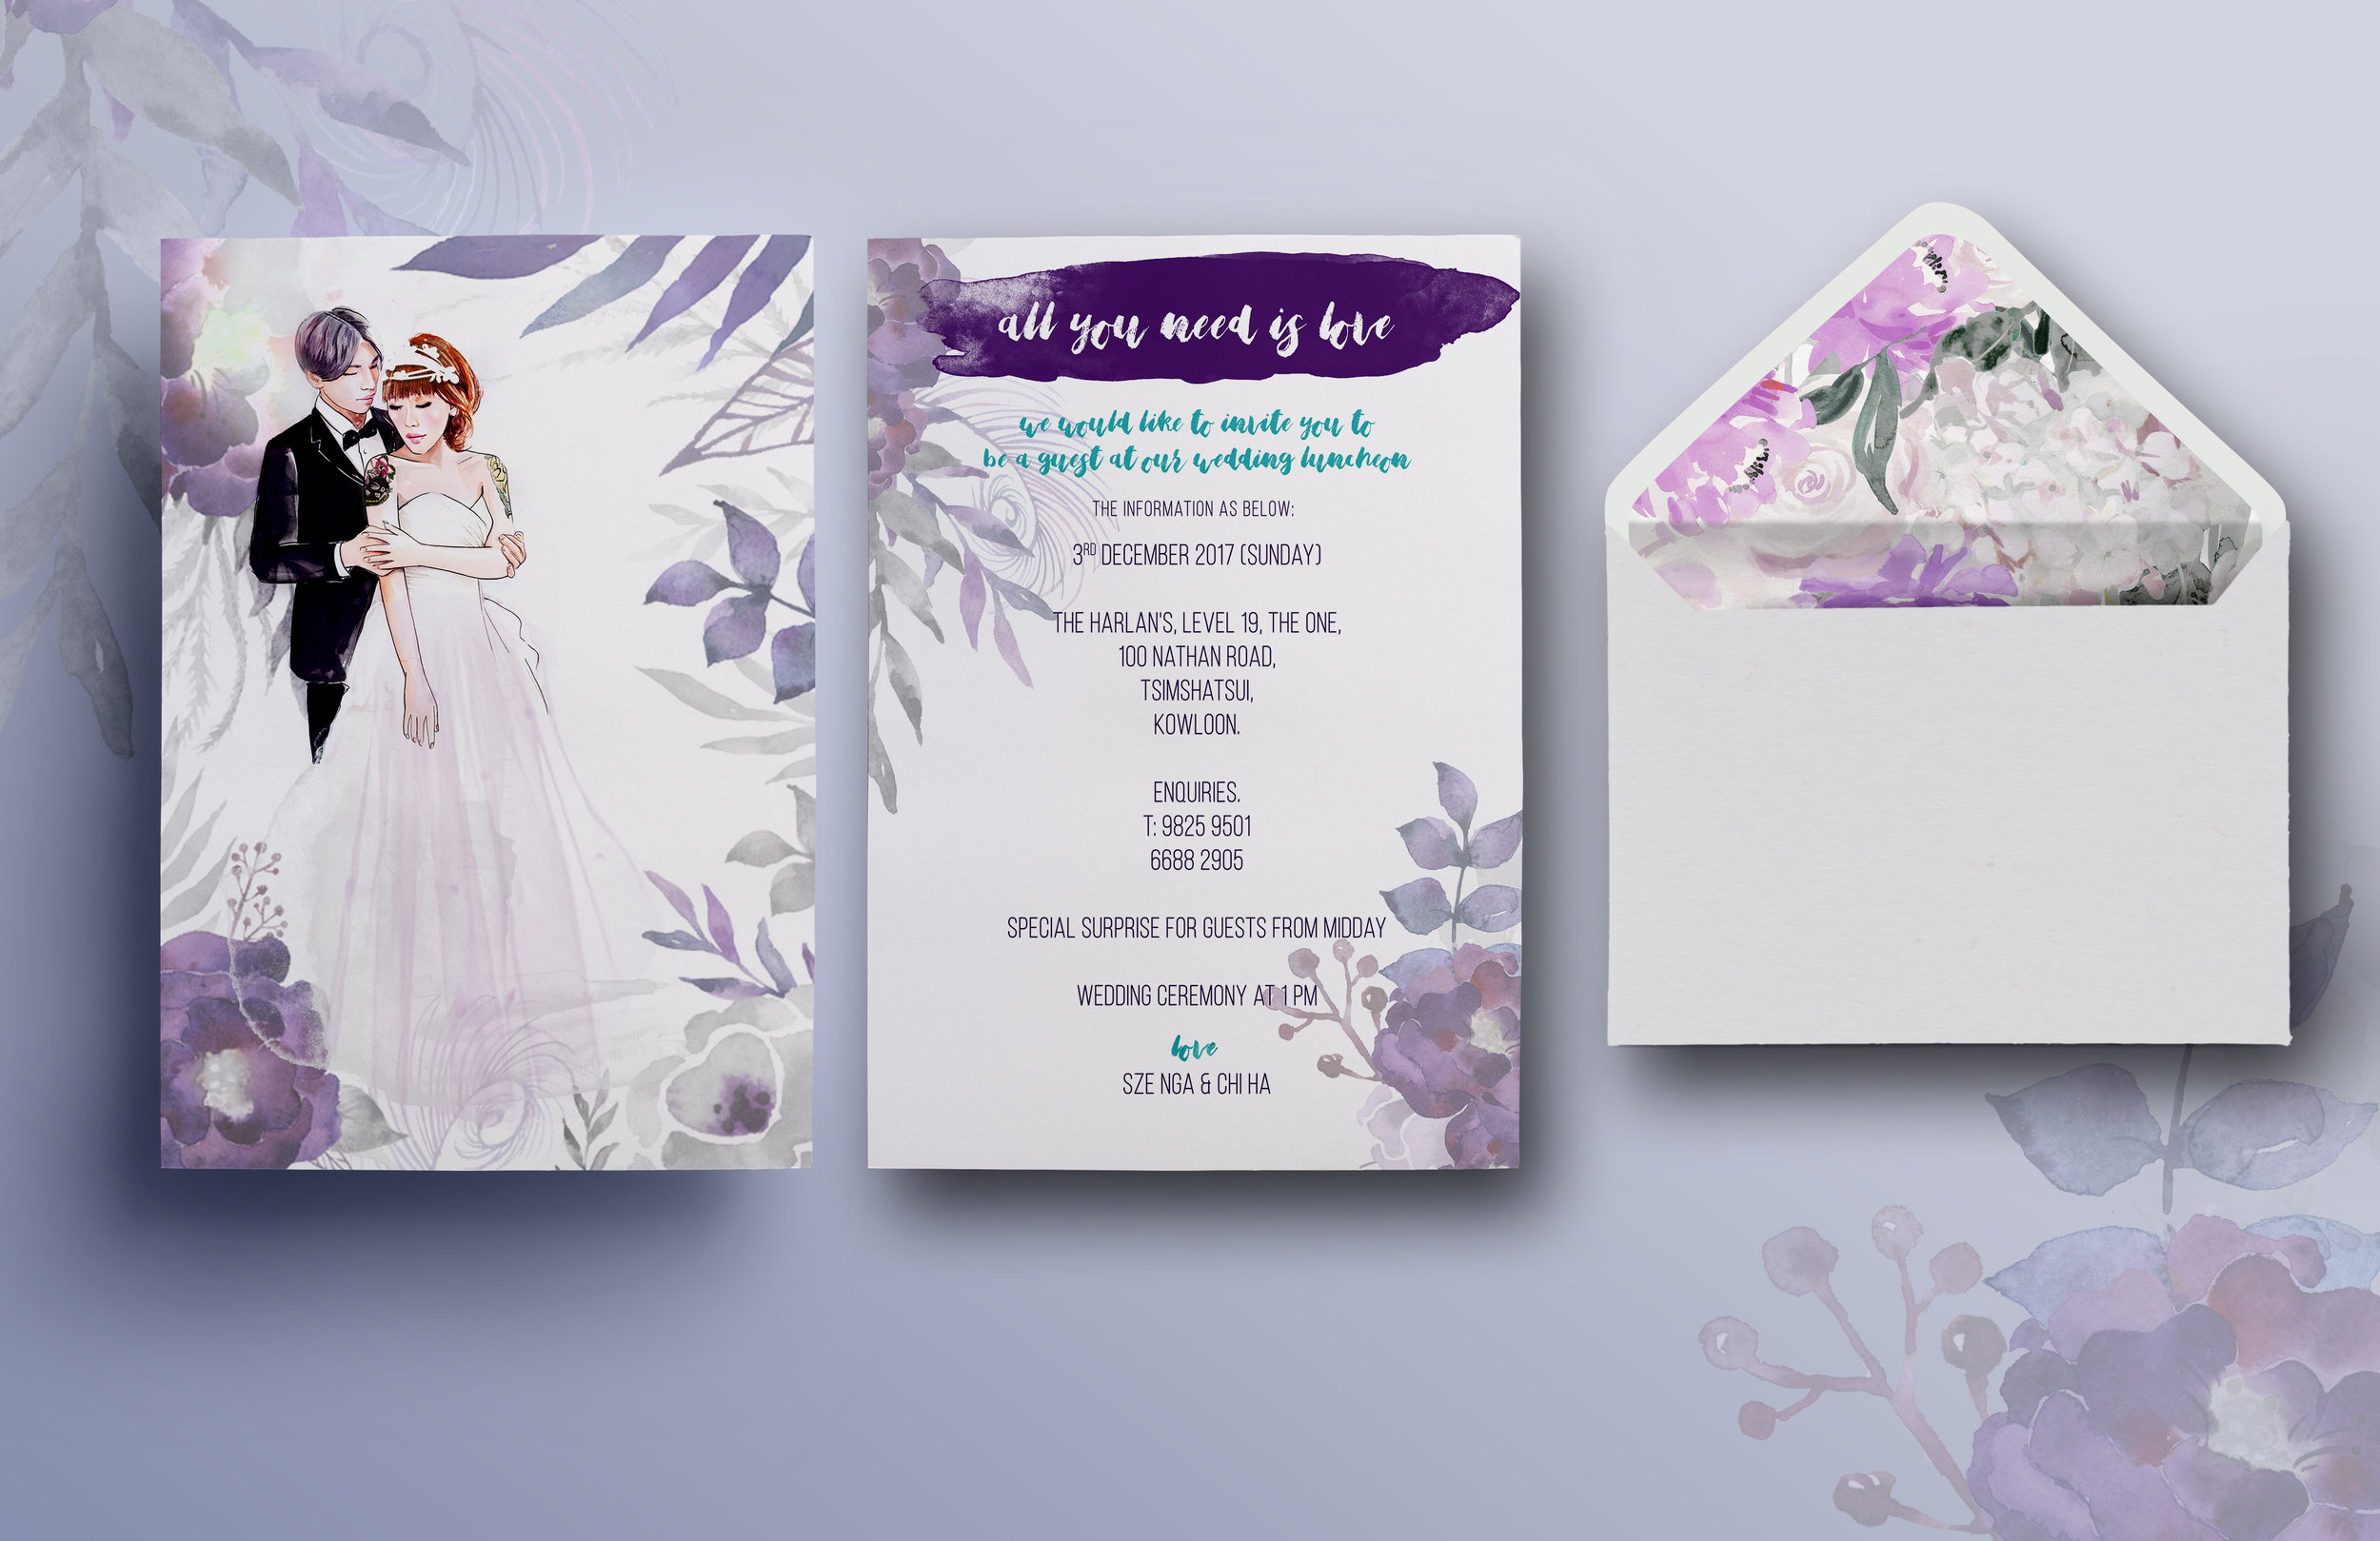 Lung Wong Wedding Stationary.jpg